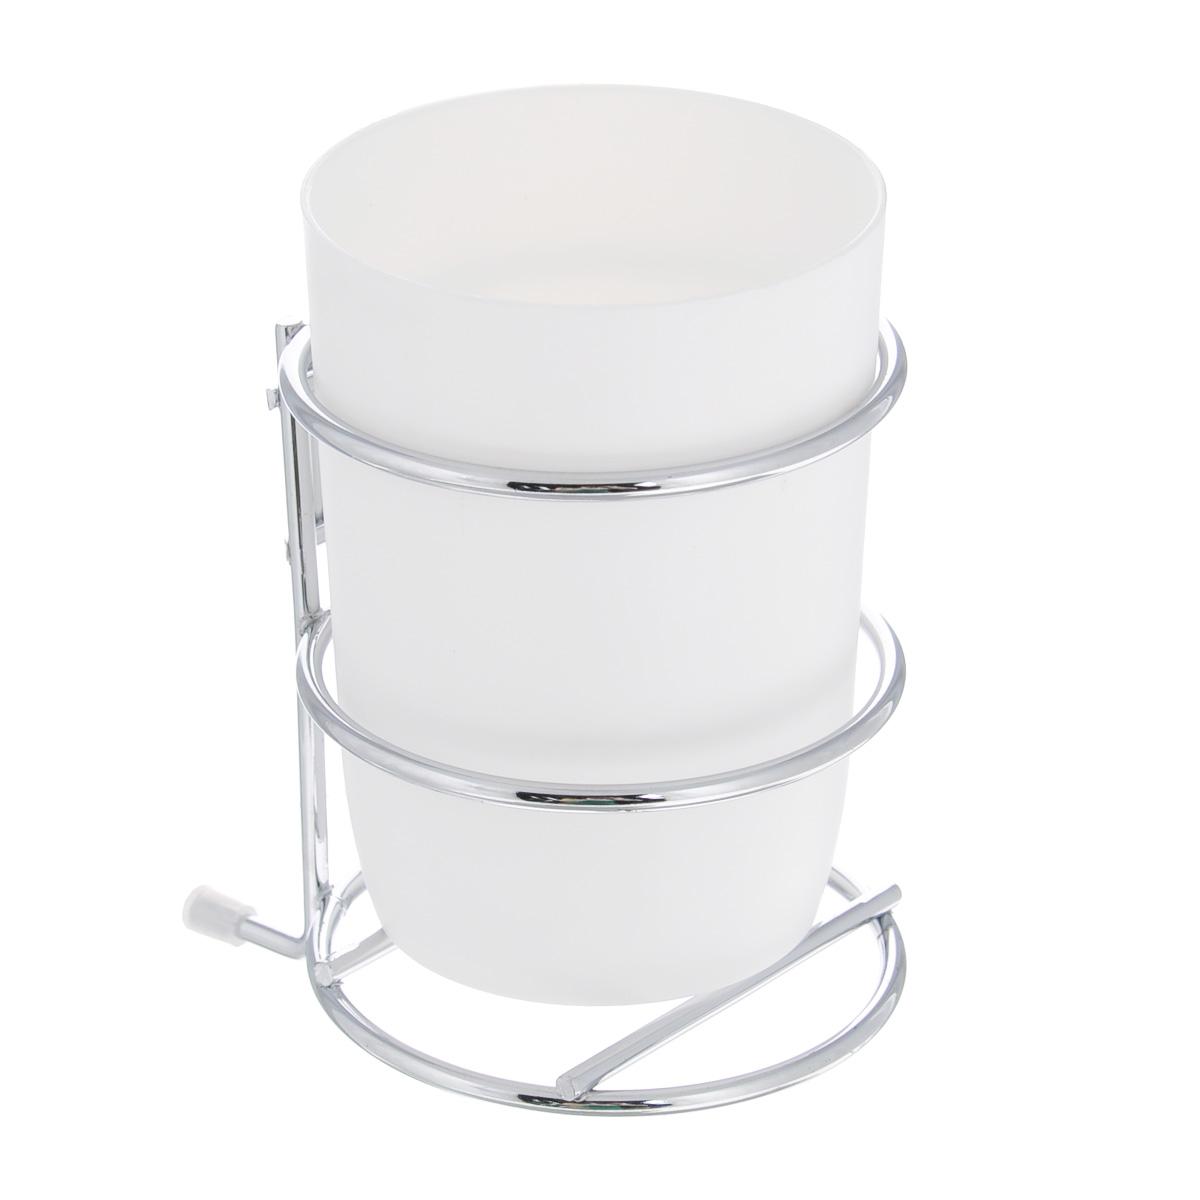 Стакан для зубных щеток Wenko Milazzo, с держателем16984100